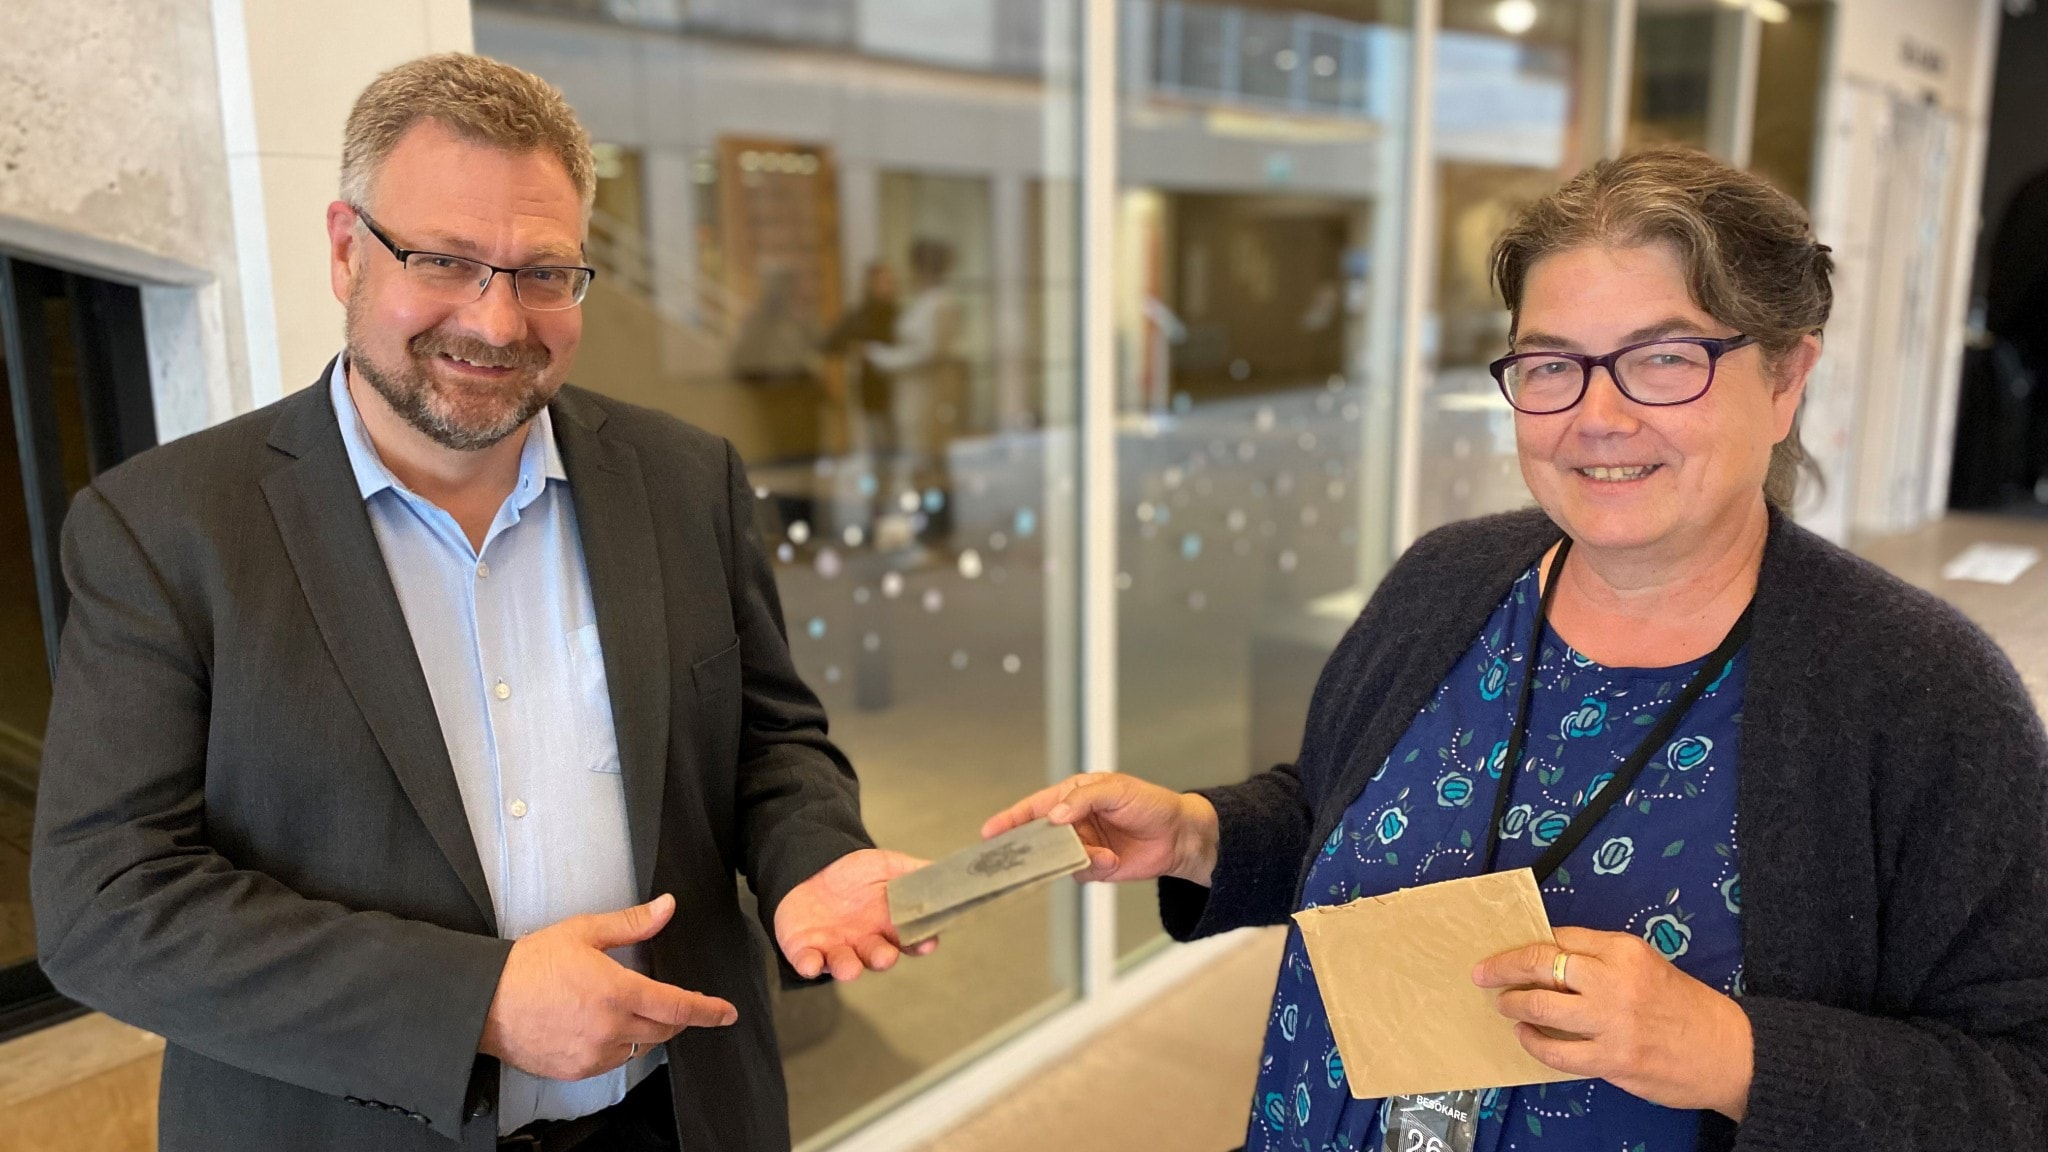 Susann hittade John Bauers sista pass i mosters byrålåda